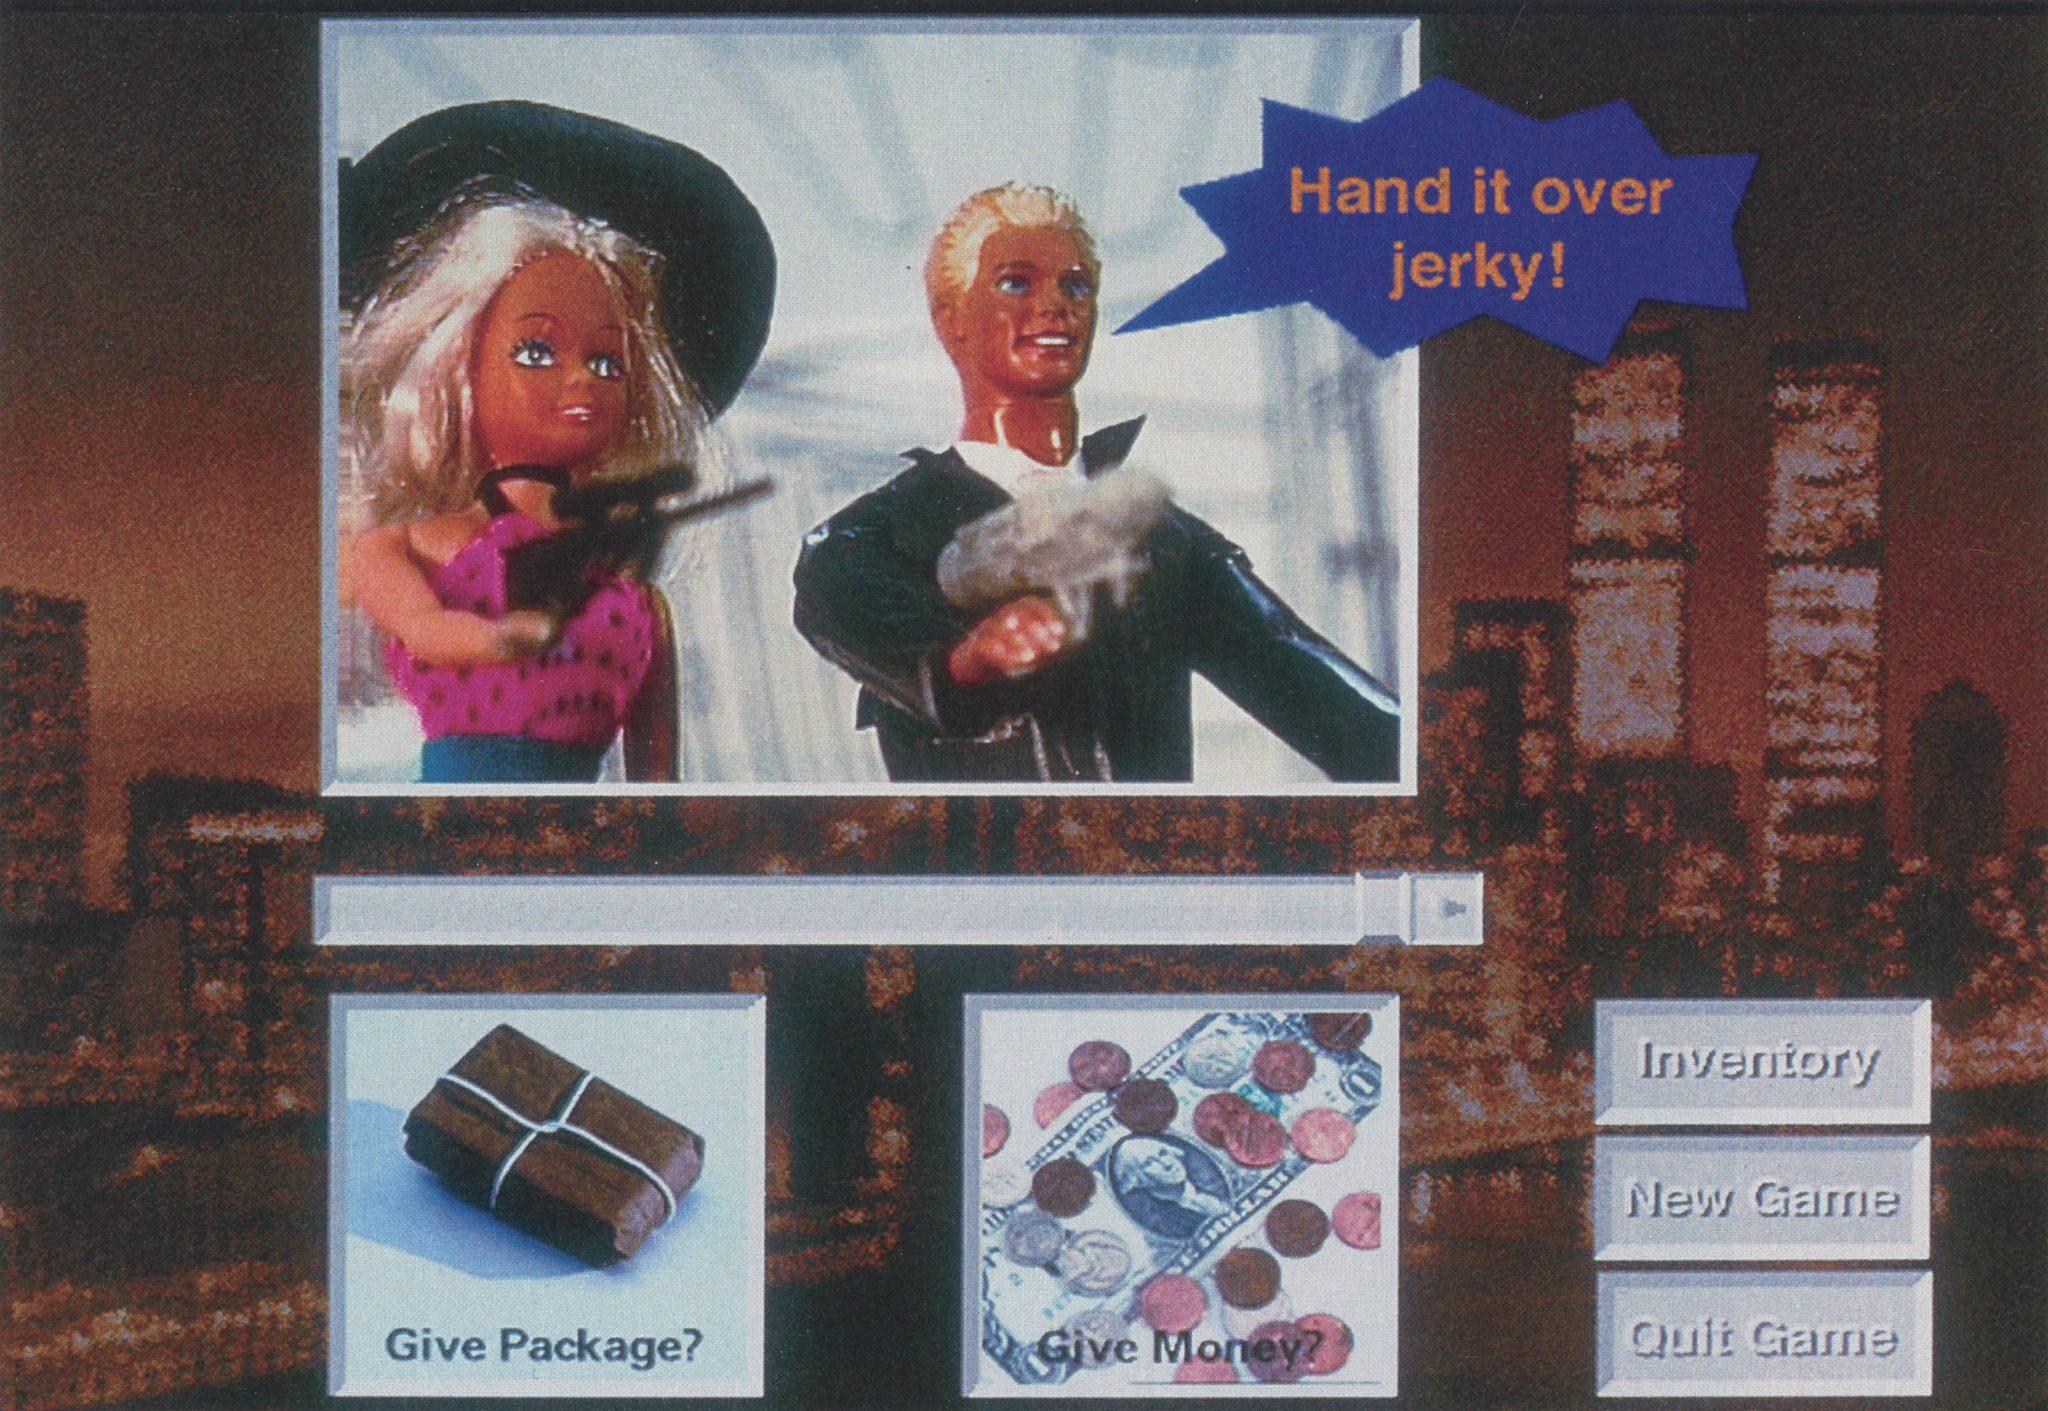 ©1993, Kim Bauer, Michael DiComo, Daniel Leung, and Jacquelyn Martino, Don't Drop the Package